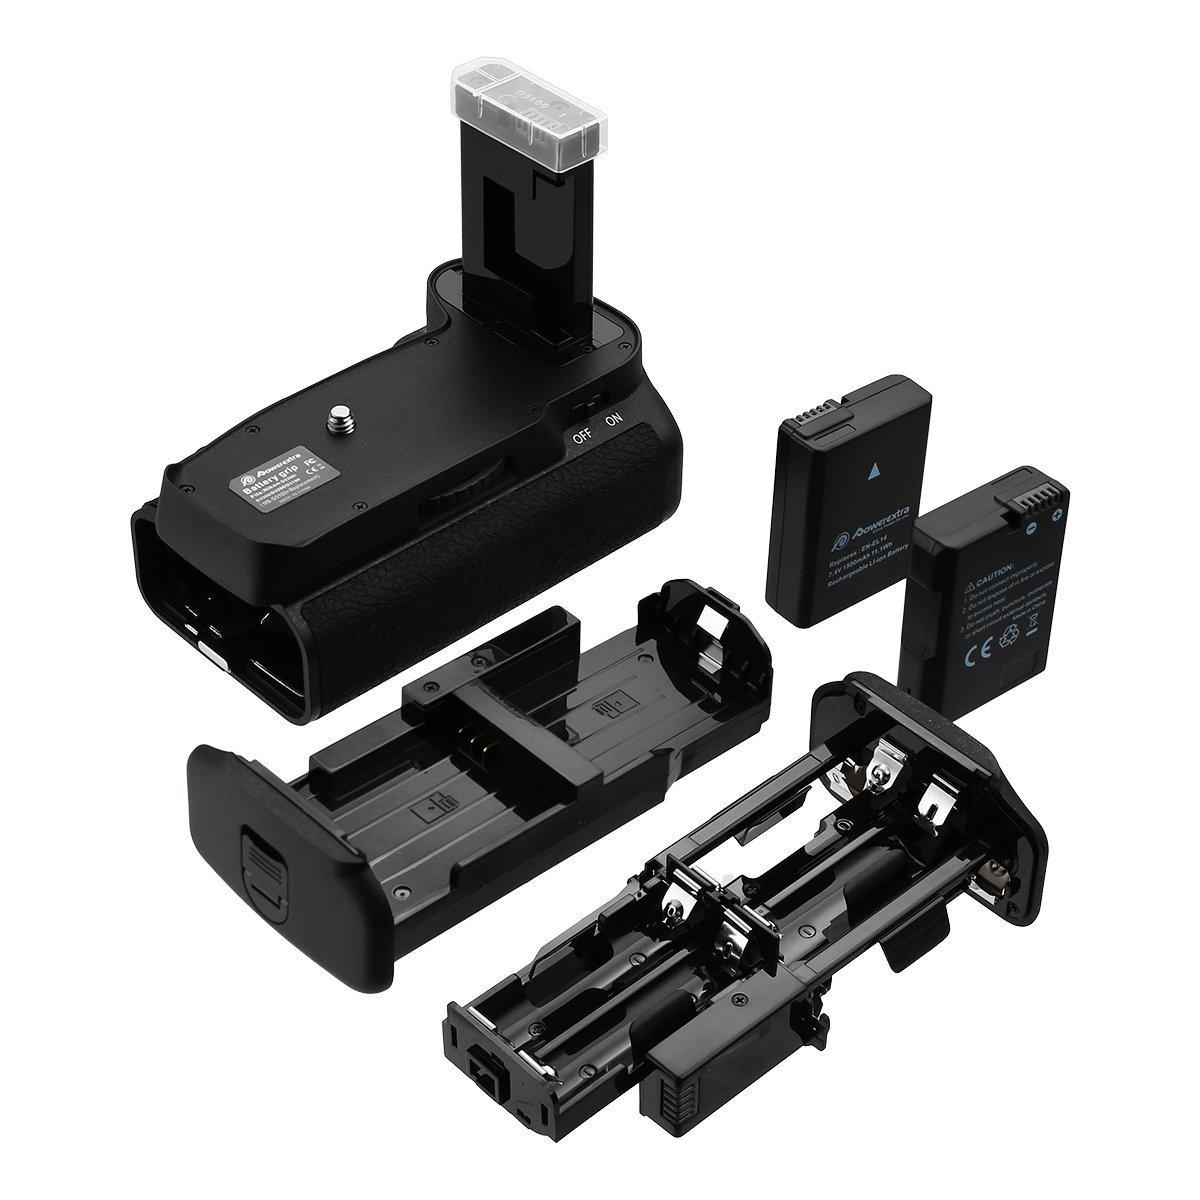 Powerextra Battery Grip + 2 × High Capacity 1500mAh EN-EL14 With Infrared Remote Control for Nikon D3100/D3200/D3300/D5300 Digital SLR Camera